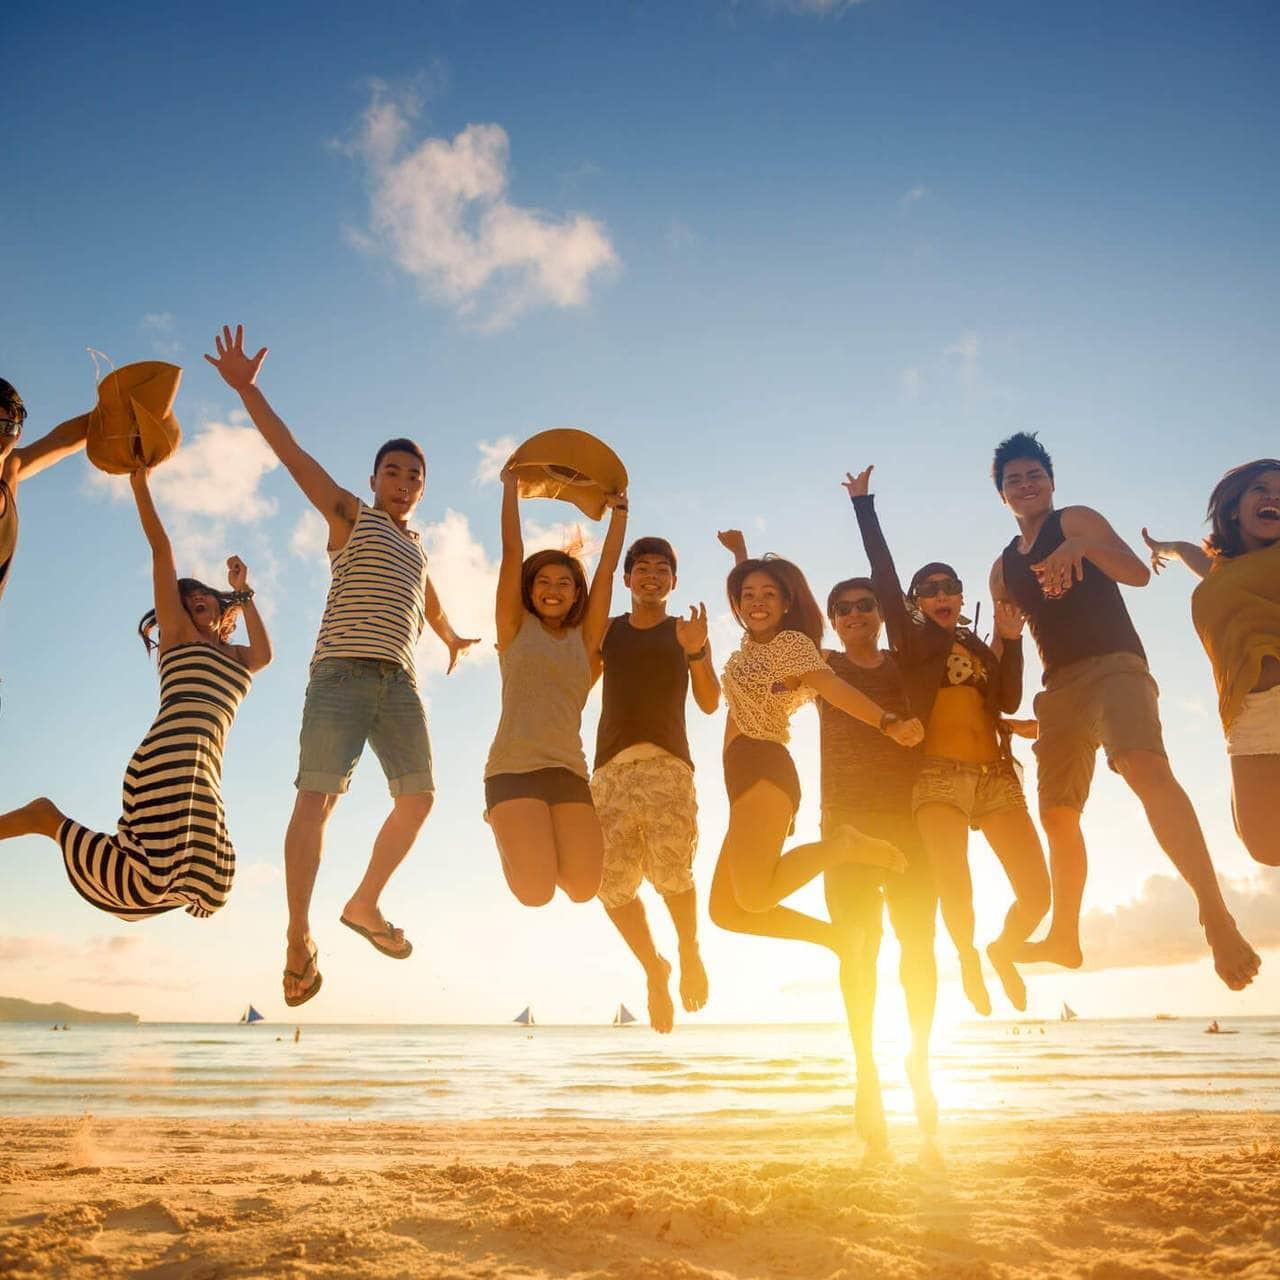 student travel groups